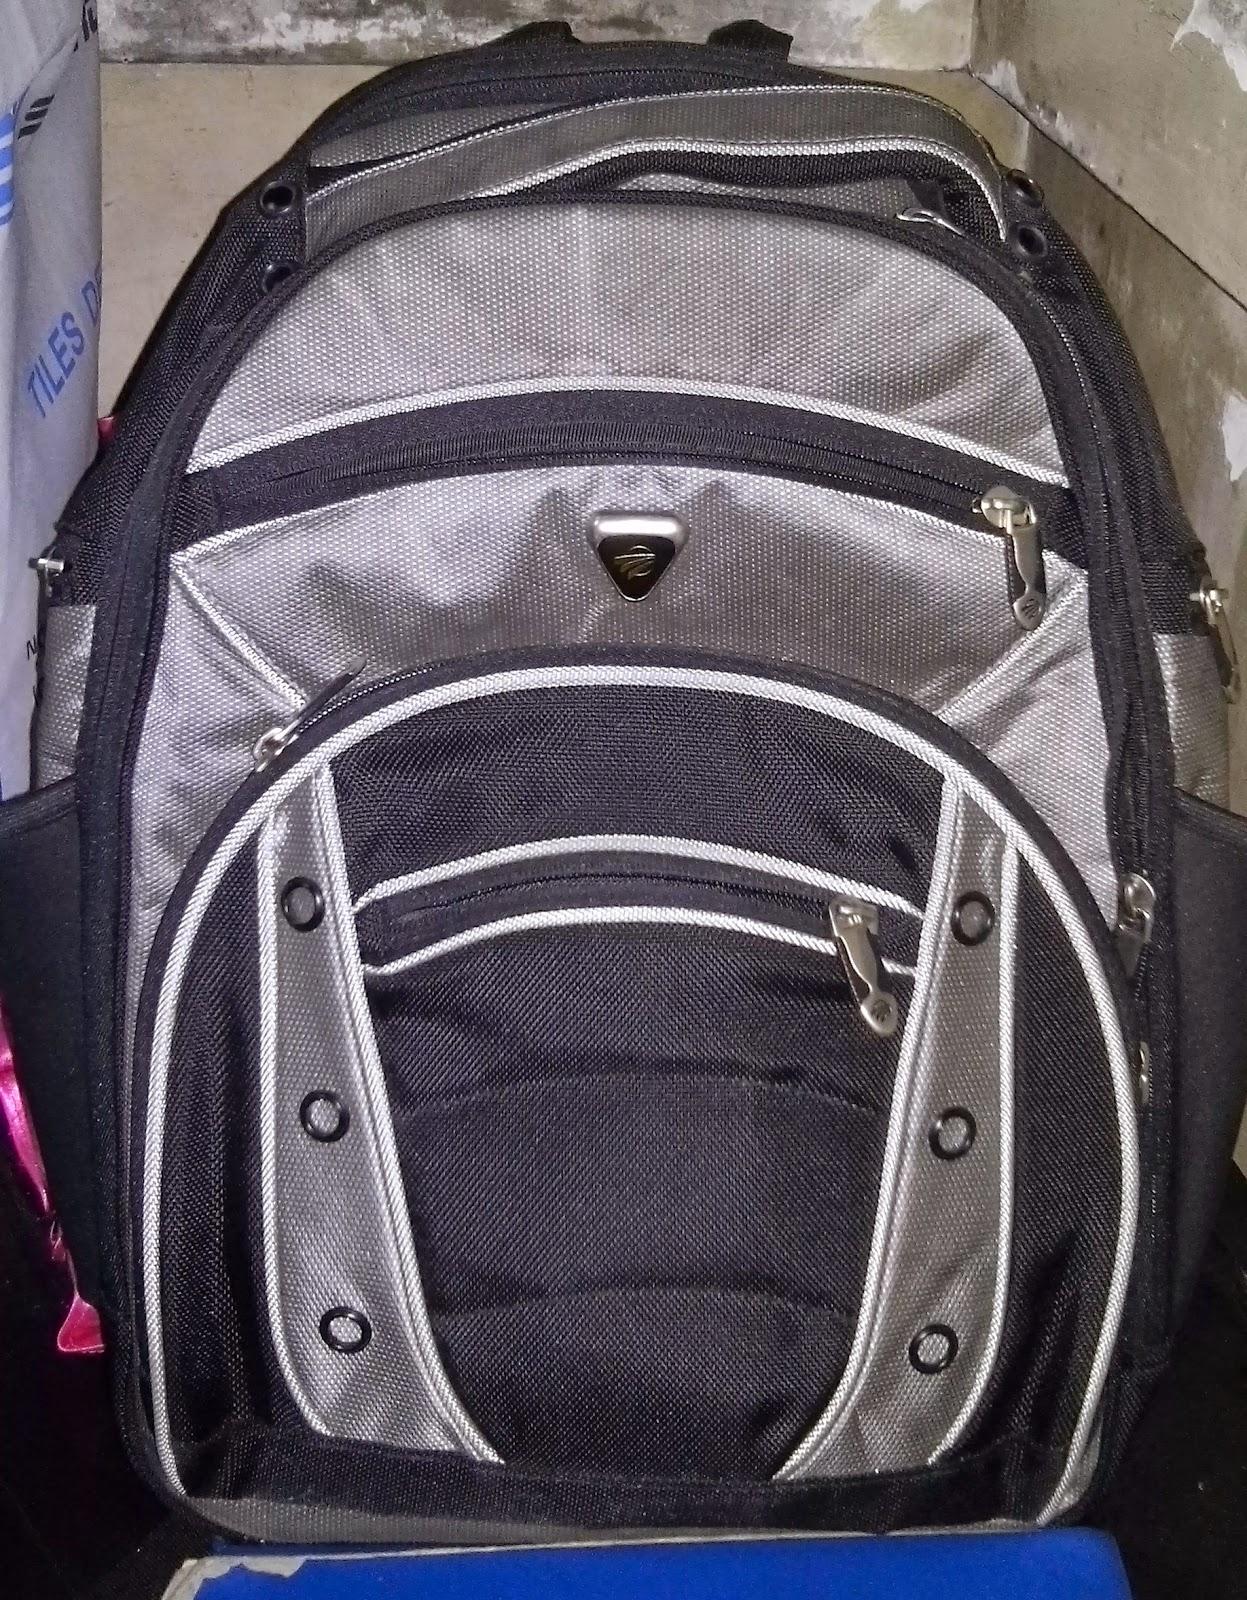 europak backpack